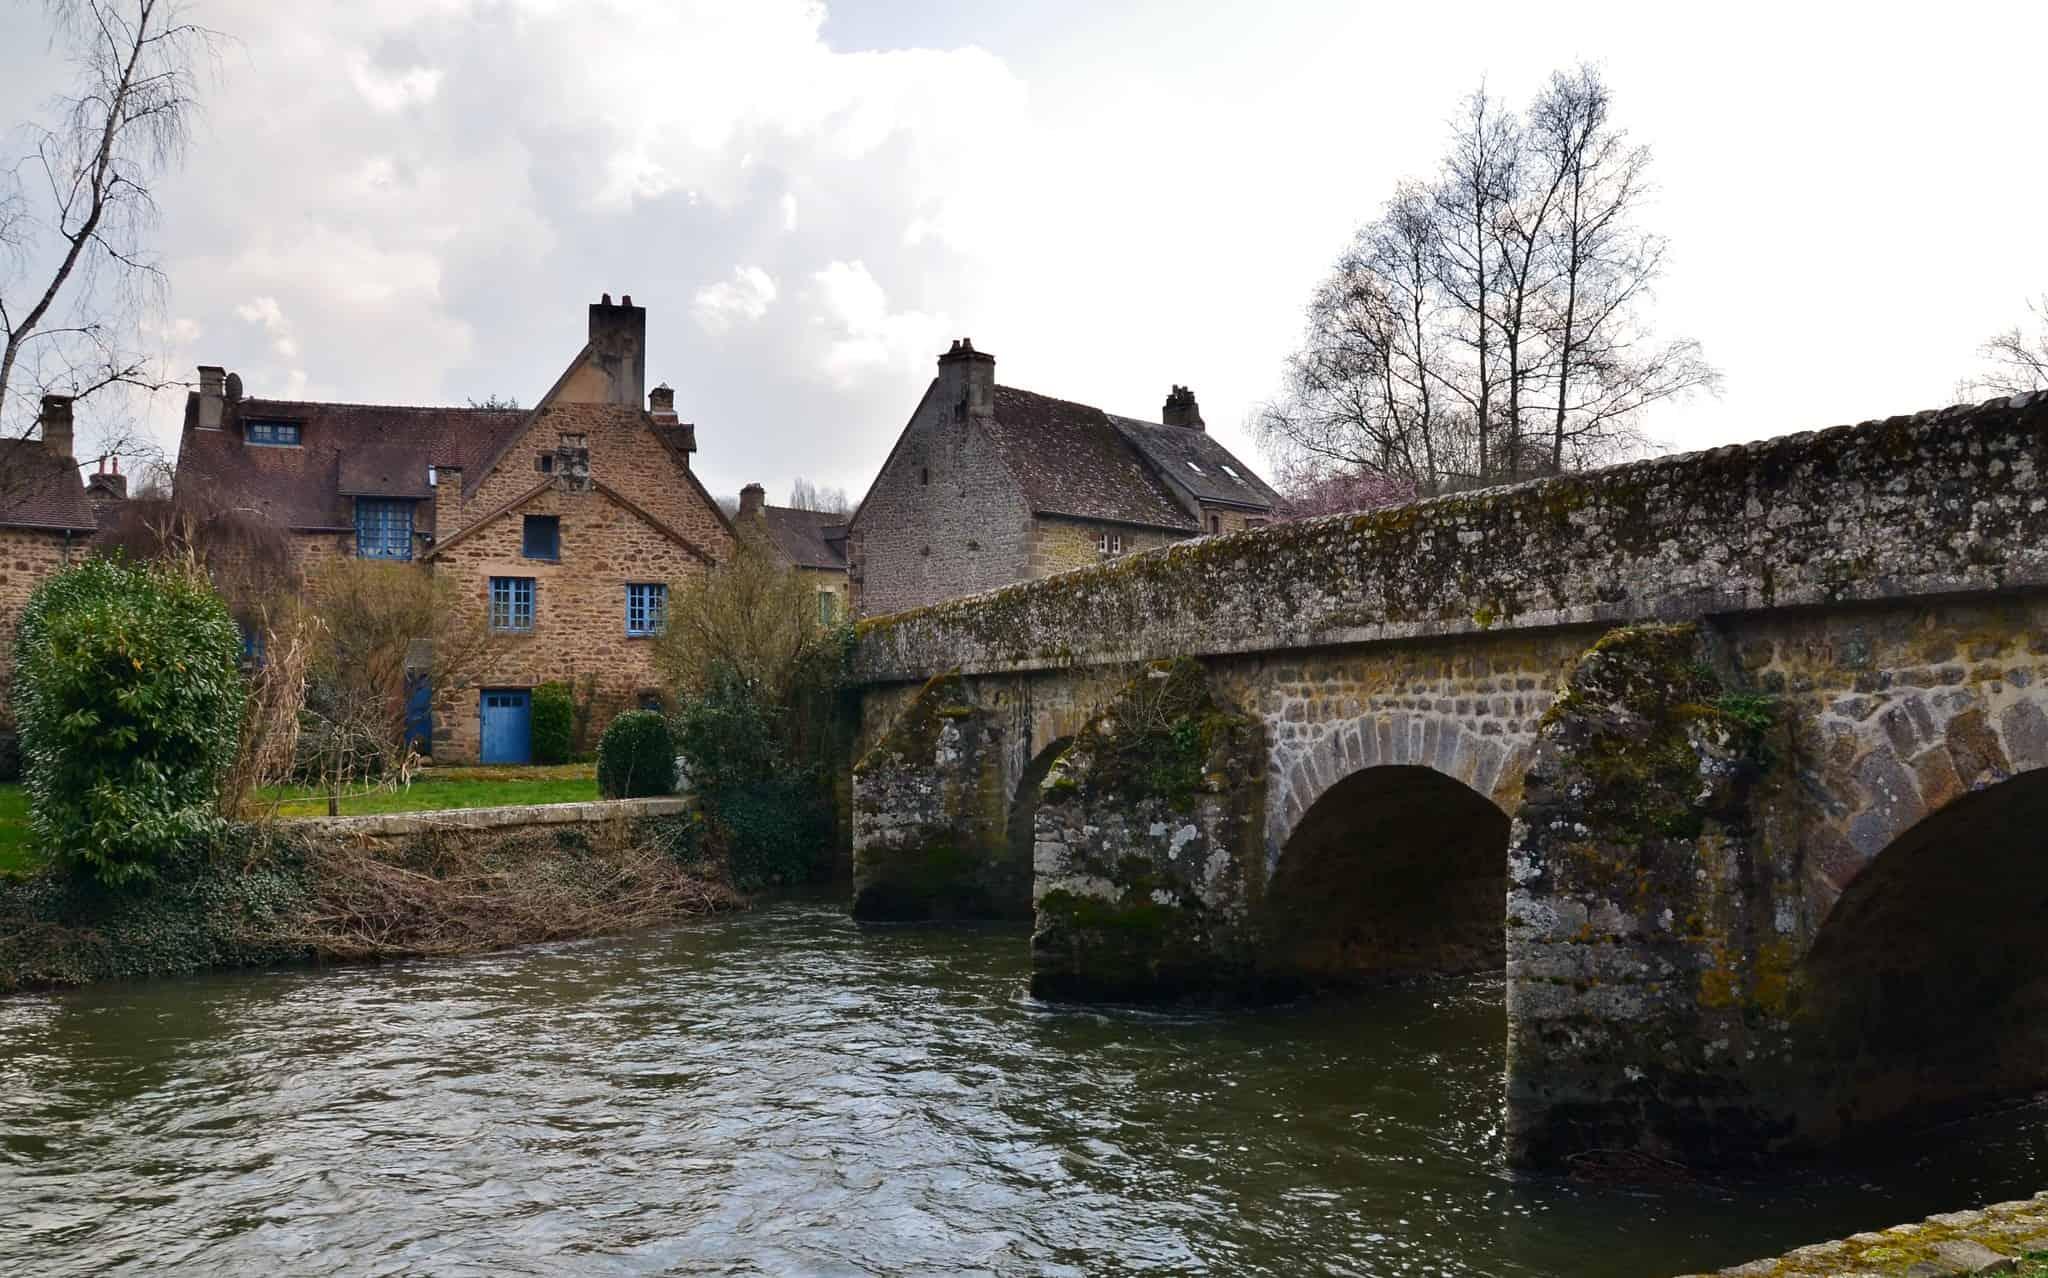 Saint-Cenery-Le-Gerei, een van de mooiste Franse dorpjes.